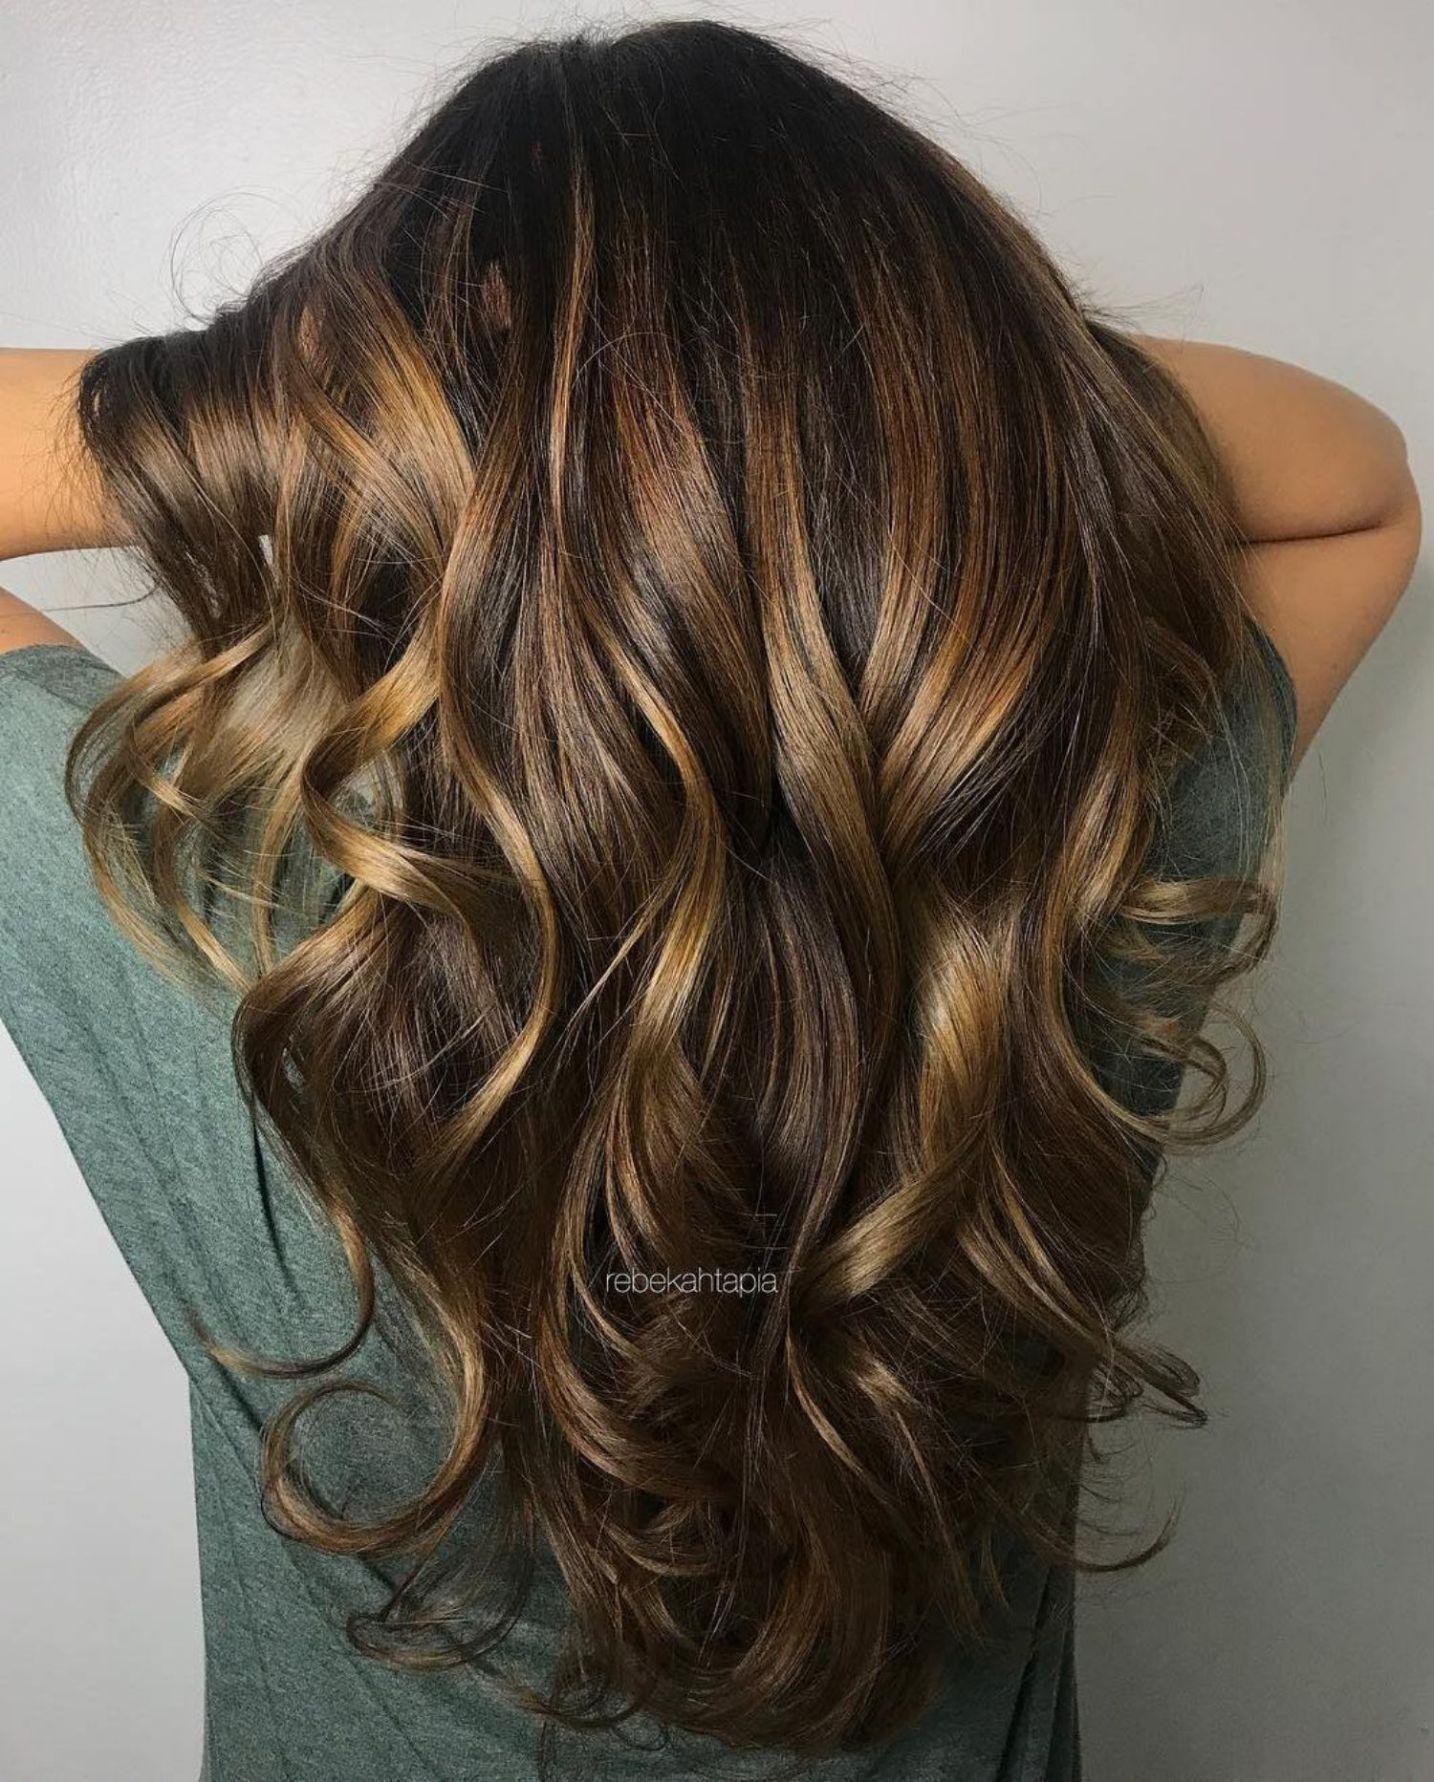 60 Hairstyles Featuring Dark Brown Hair With Highlights Hair Color Flamboyage Brown Blonde Hair Brown Hair With Highlights